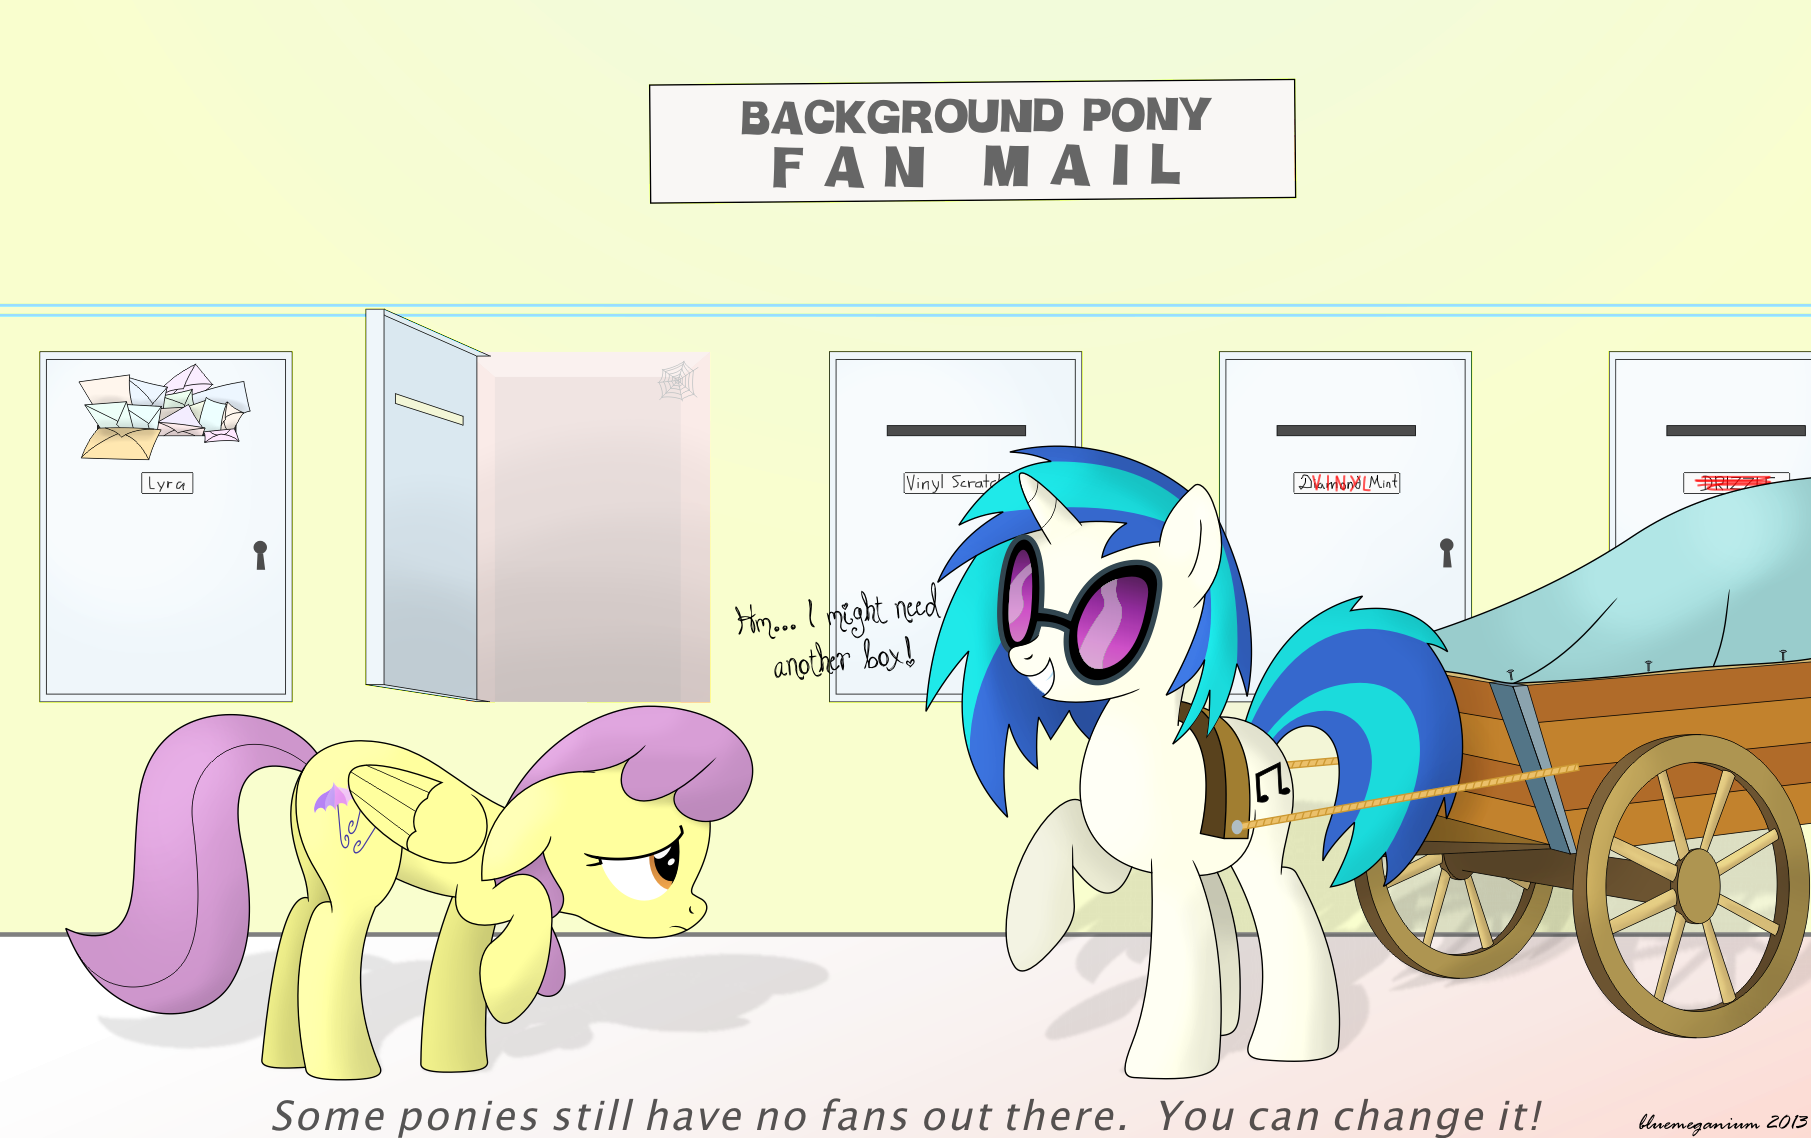 Background Pony Fan Mail by bluemeganium